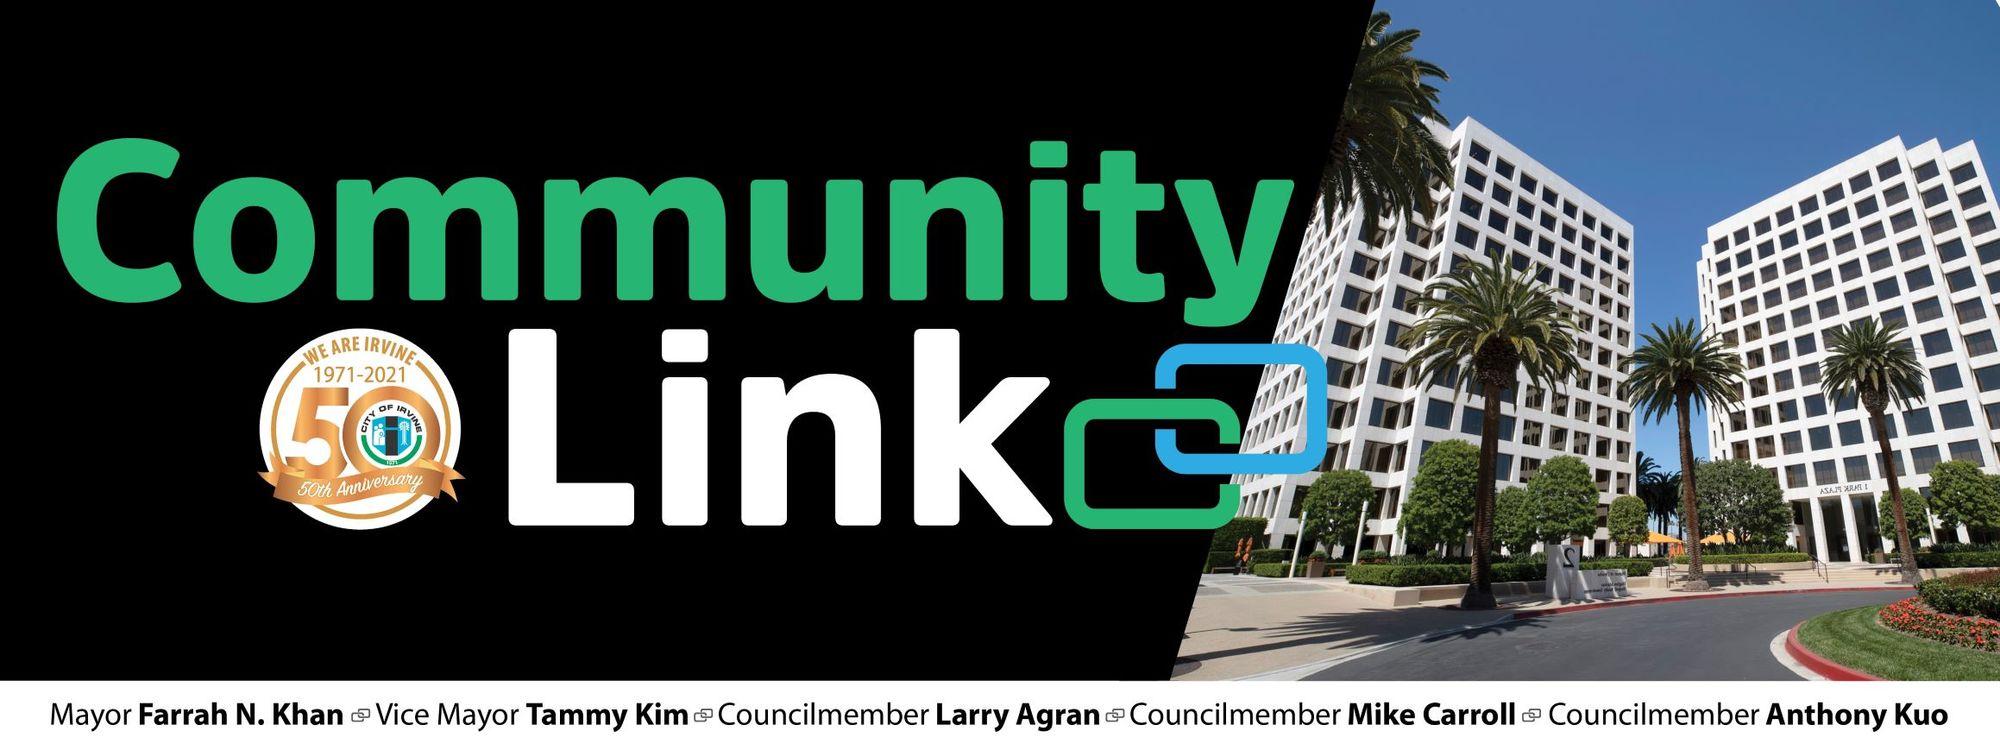 Community Link Newsletter